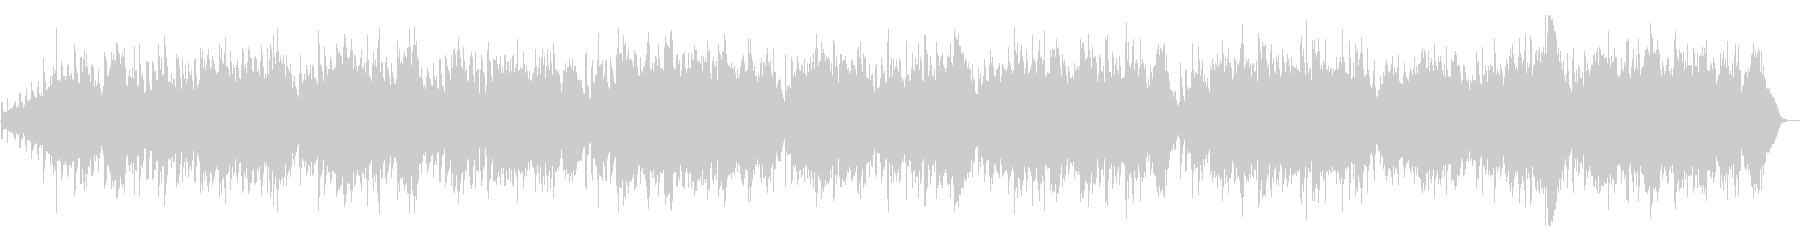 G線上のアリア(ストリングス)フルサイズの未再生の波形